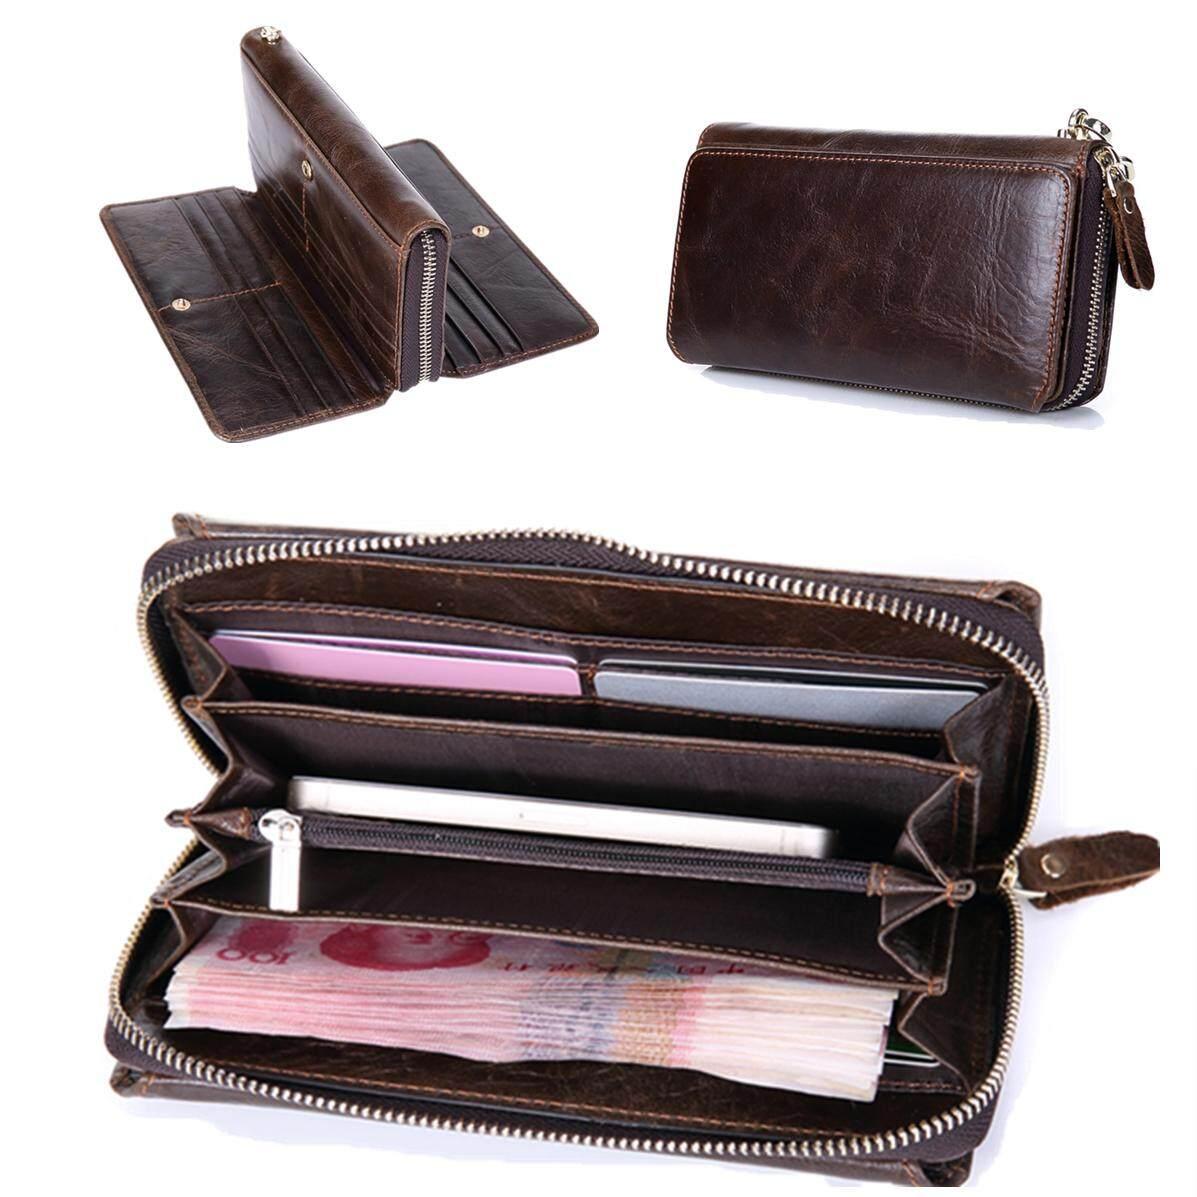 Genuine Leather Men Long Wallet Business Hasp Clutch Organizer Wallets Slim Coin Purse Card Holder Male Phone Pocket